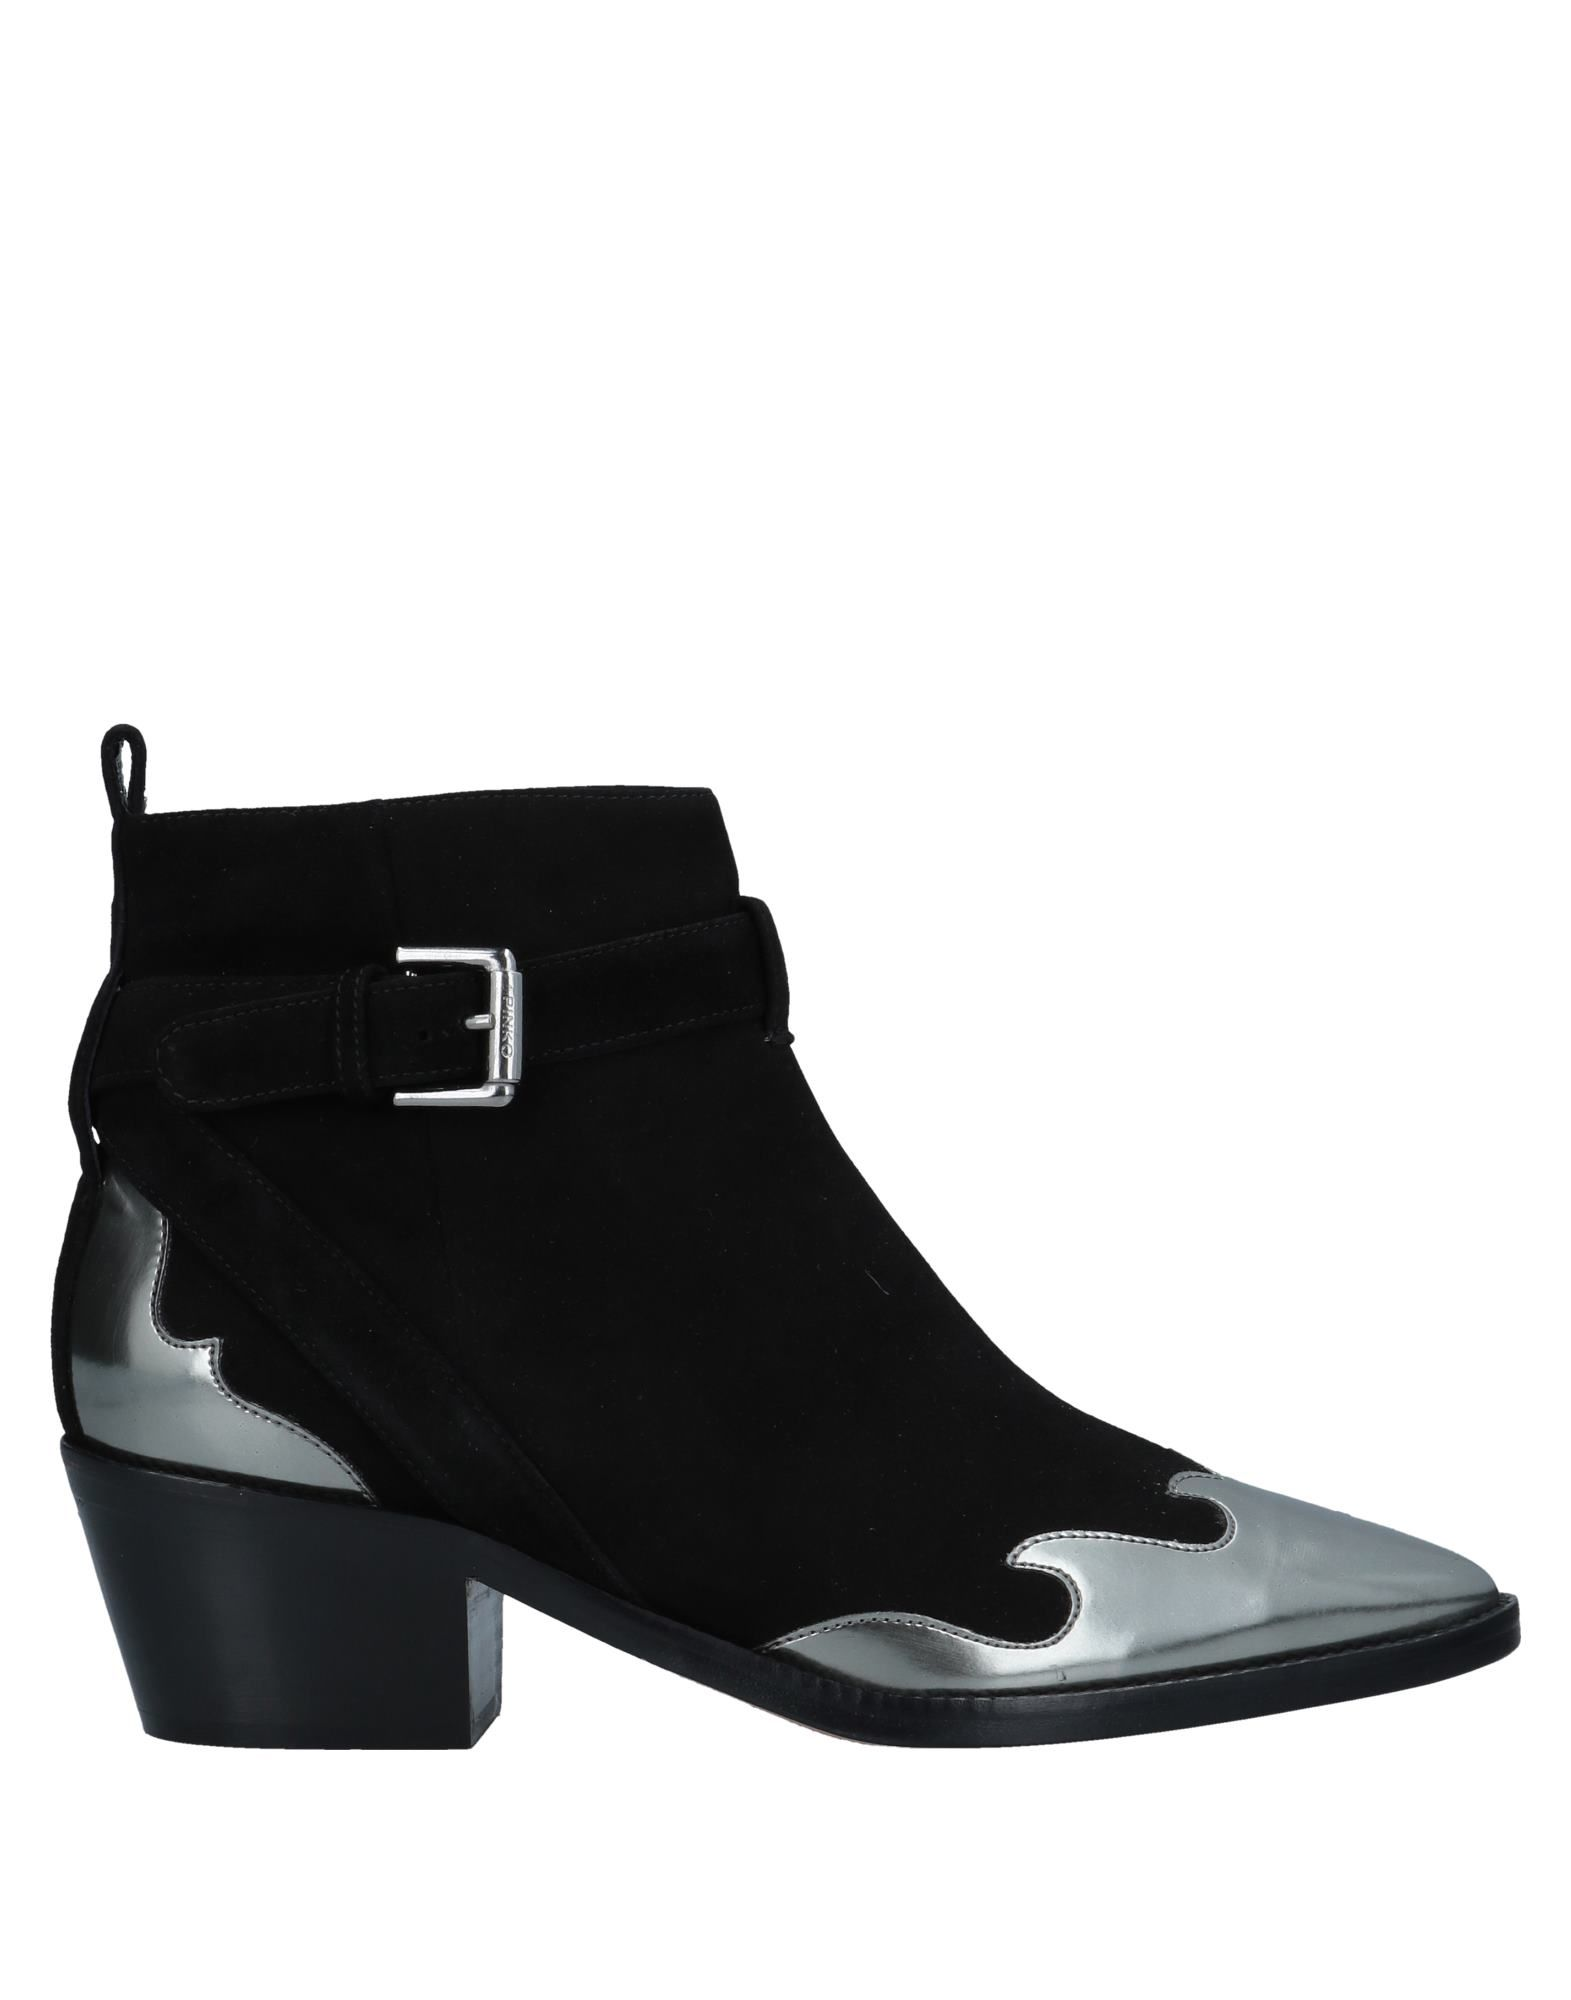 Pinko Stiefelette strapazierfähige Damen  11550557REGut aussehende strapazierfähige Stiefelette Schuhe 3a0072